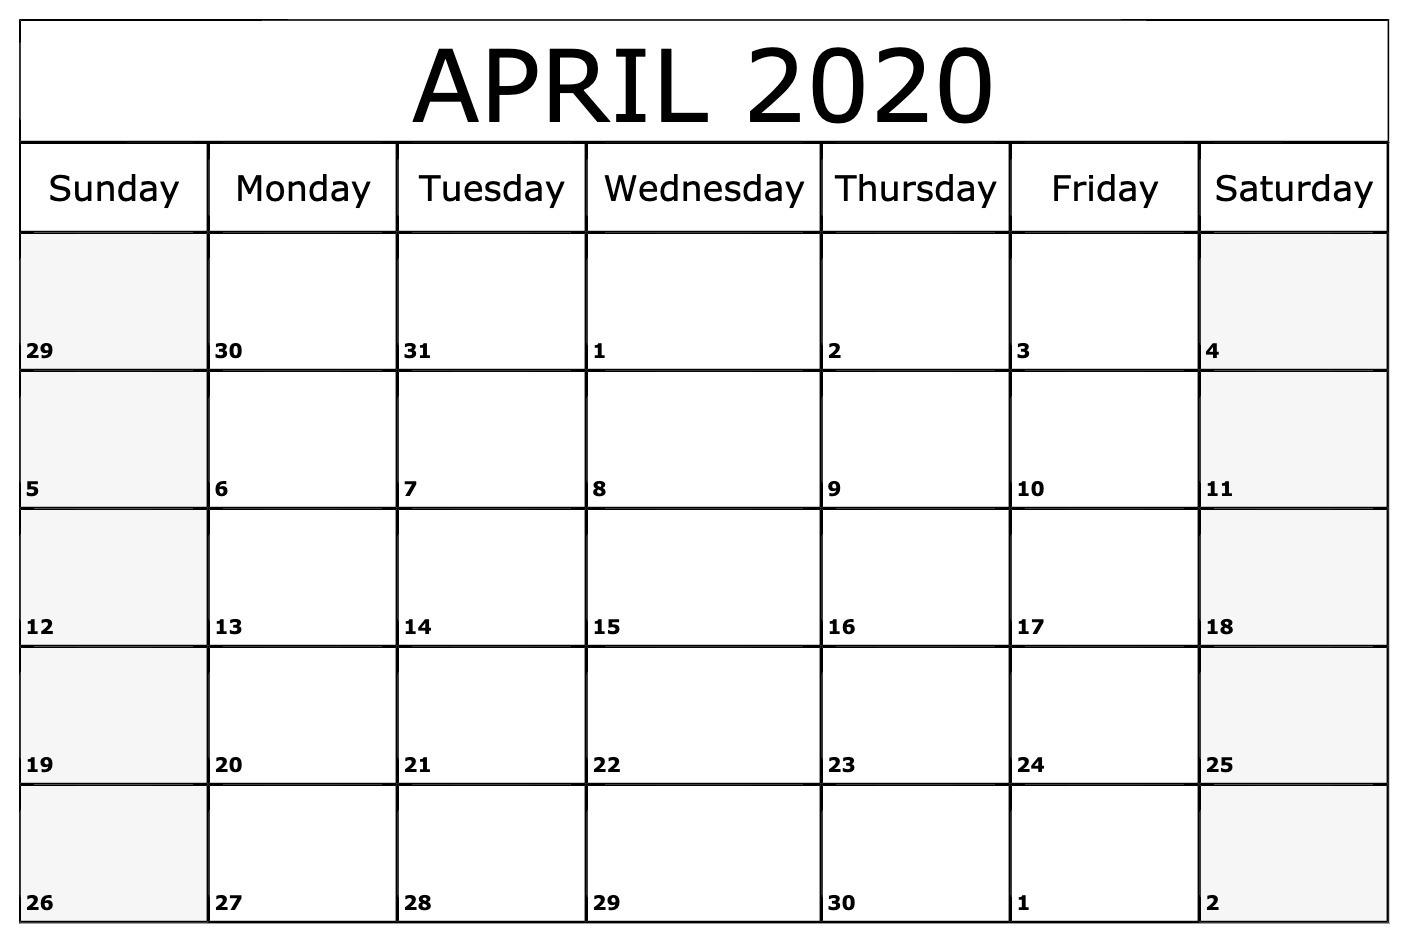 April 2020 Calendar Template Blank